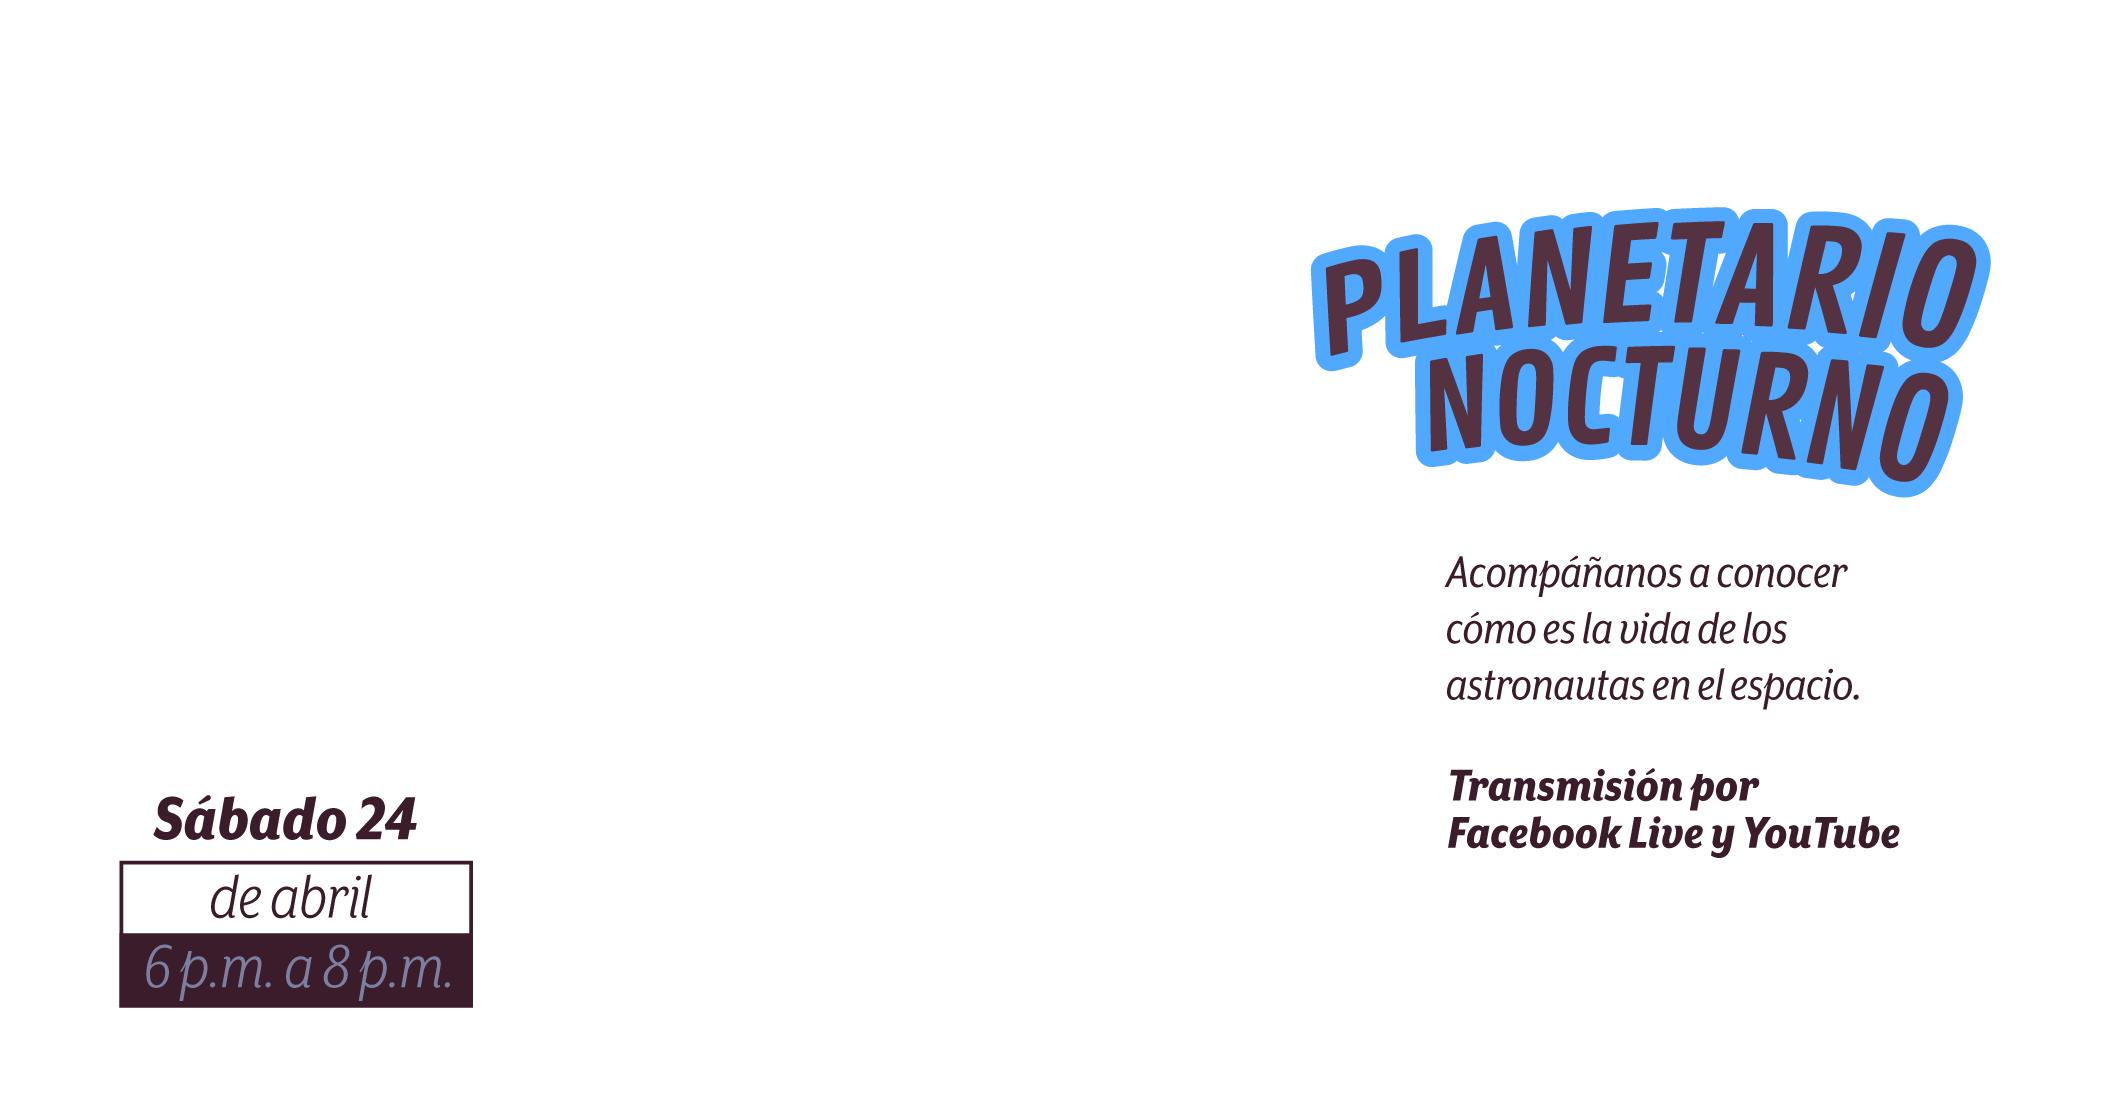 banner-Planetario-1119-x-591--Planetario-nocturno-sabado-24-de-abril-texto (1).png